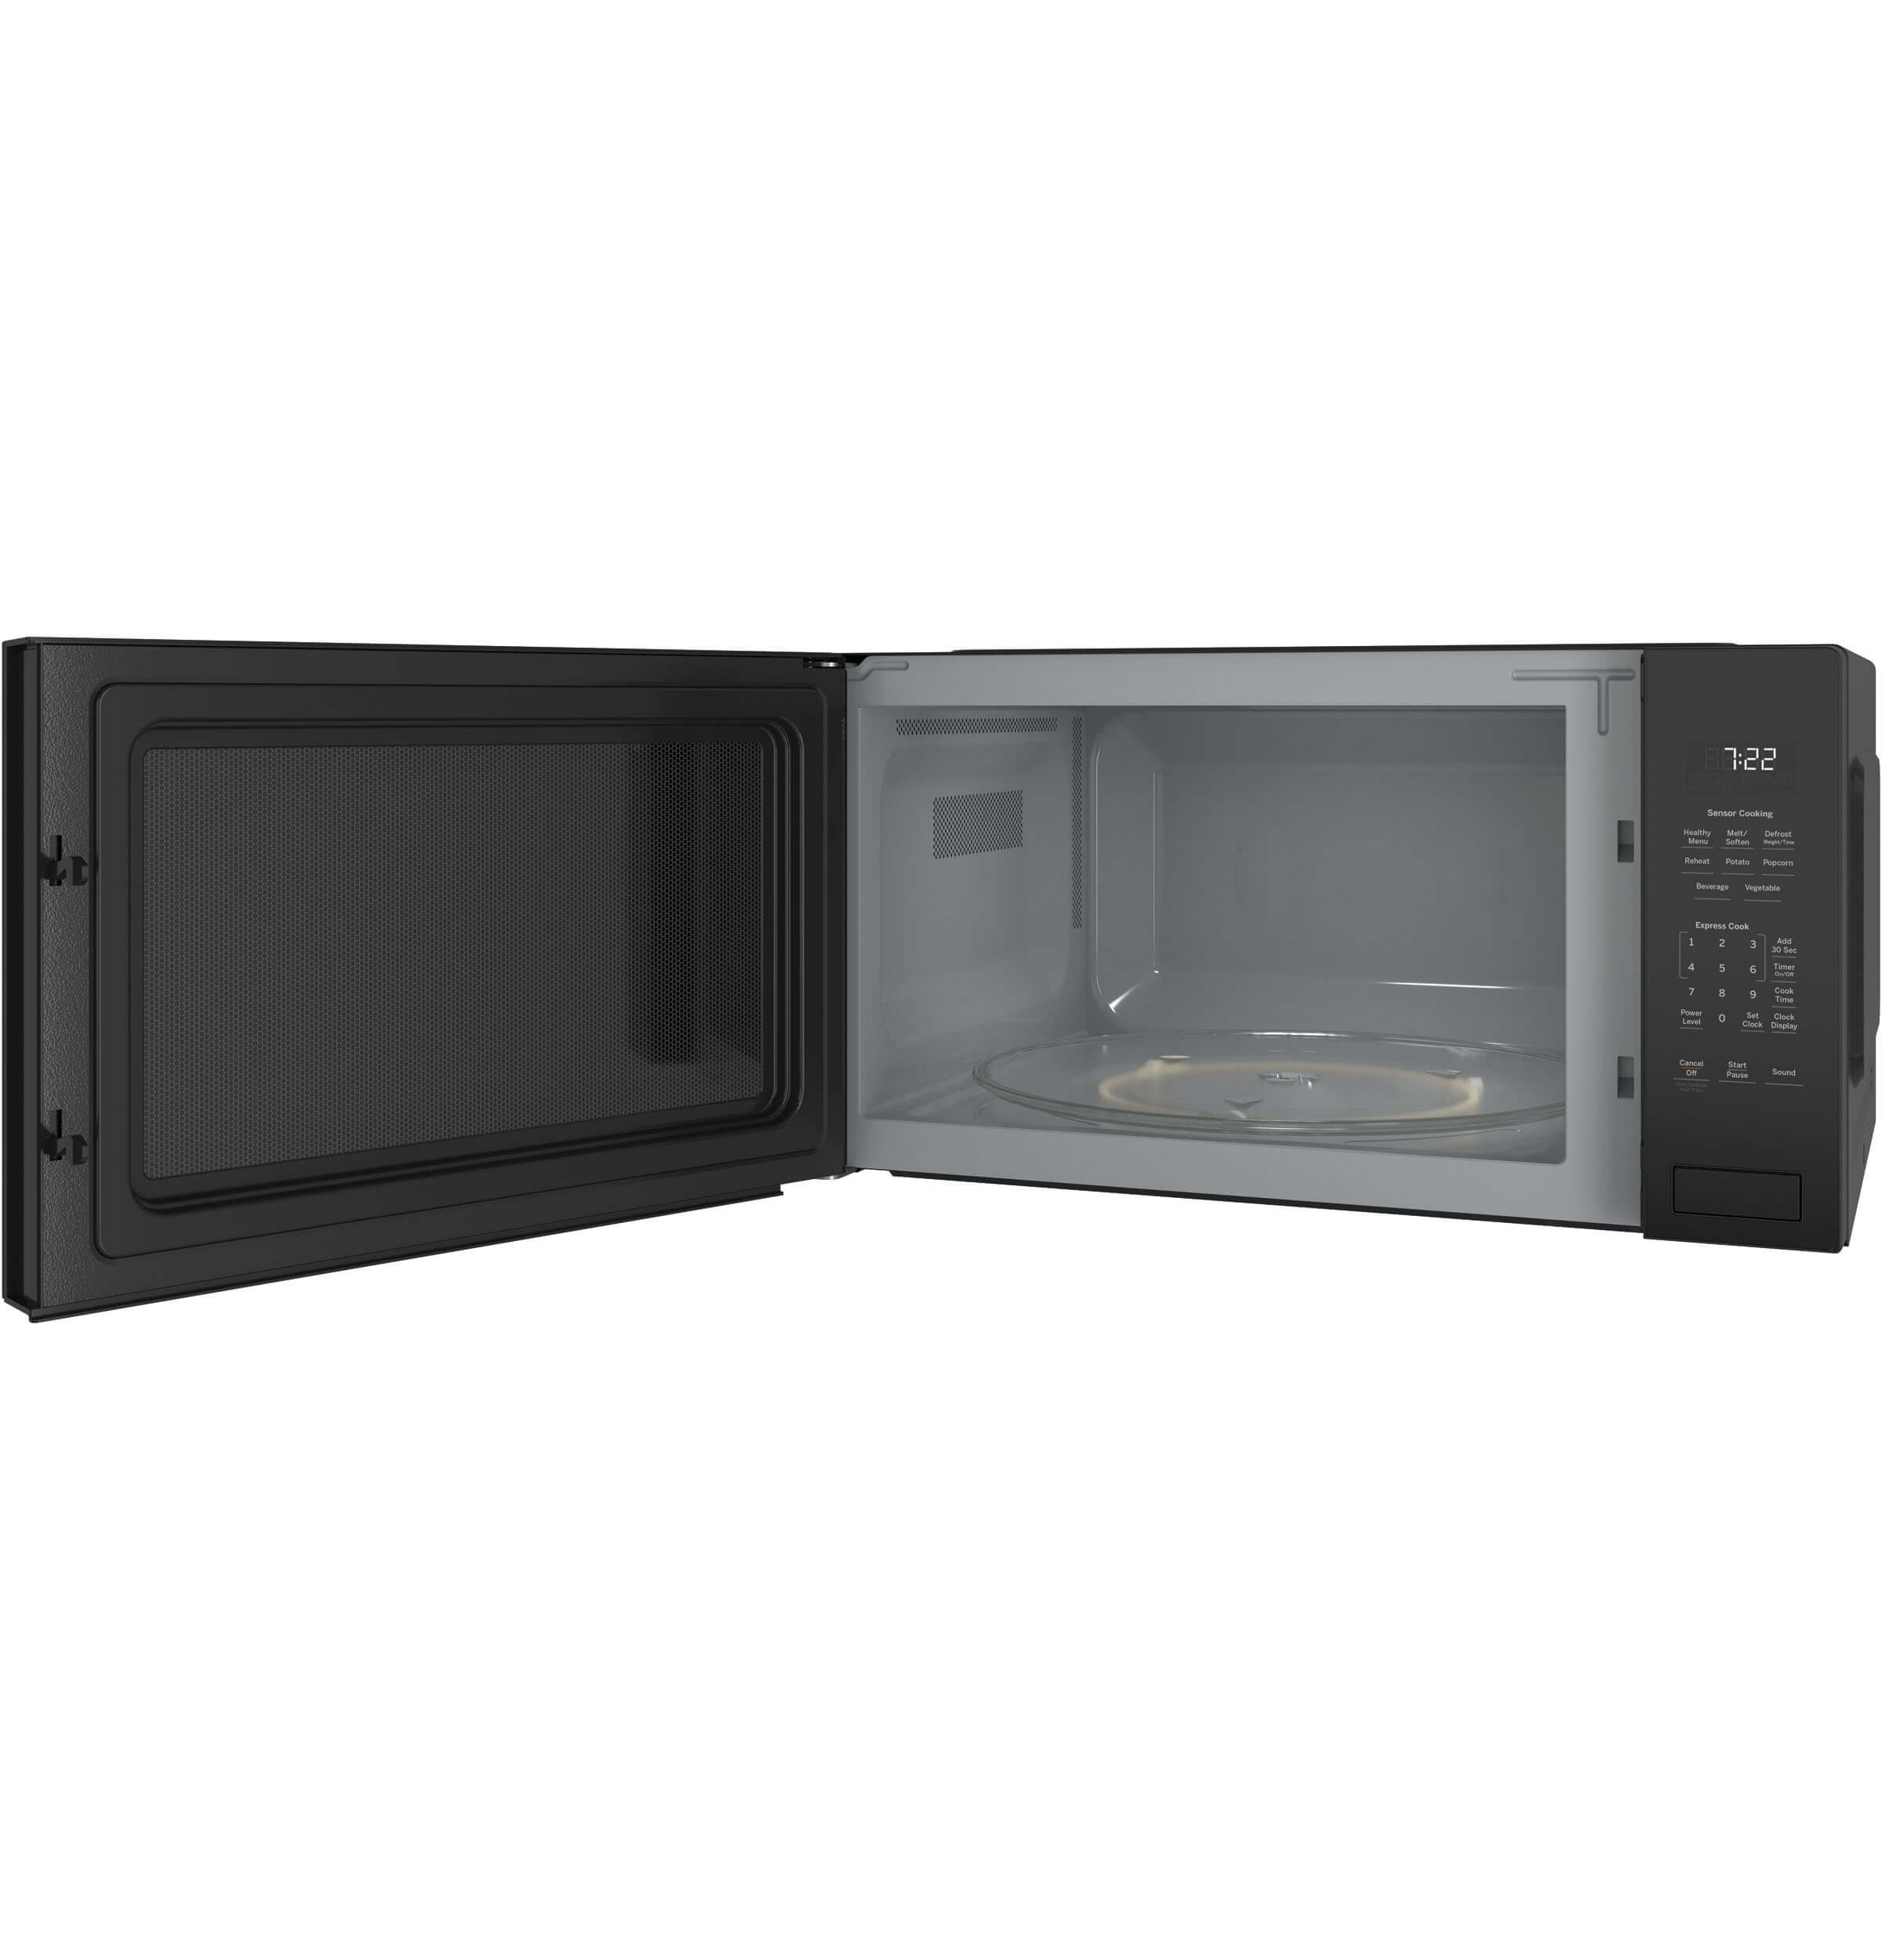 GE PEB7227DLBB Microwave Oven by GE (Image #3)